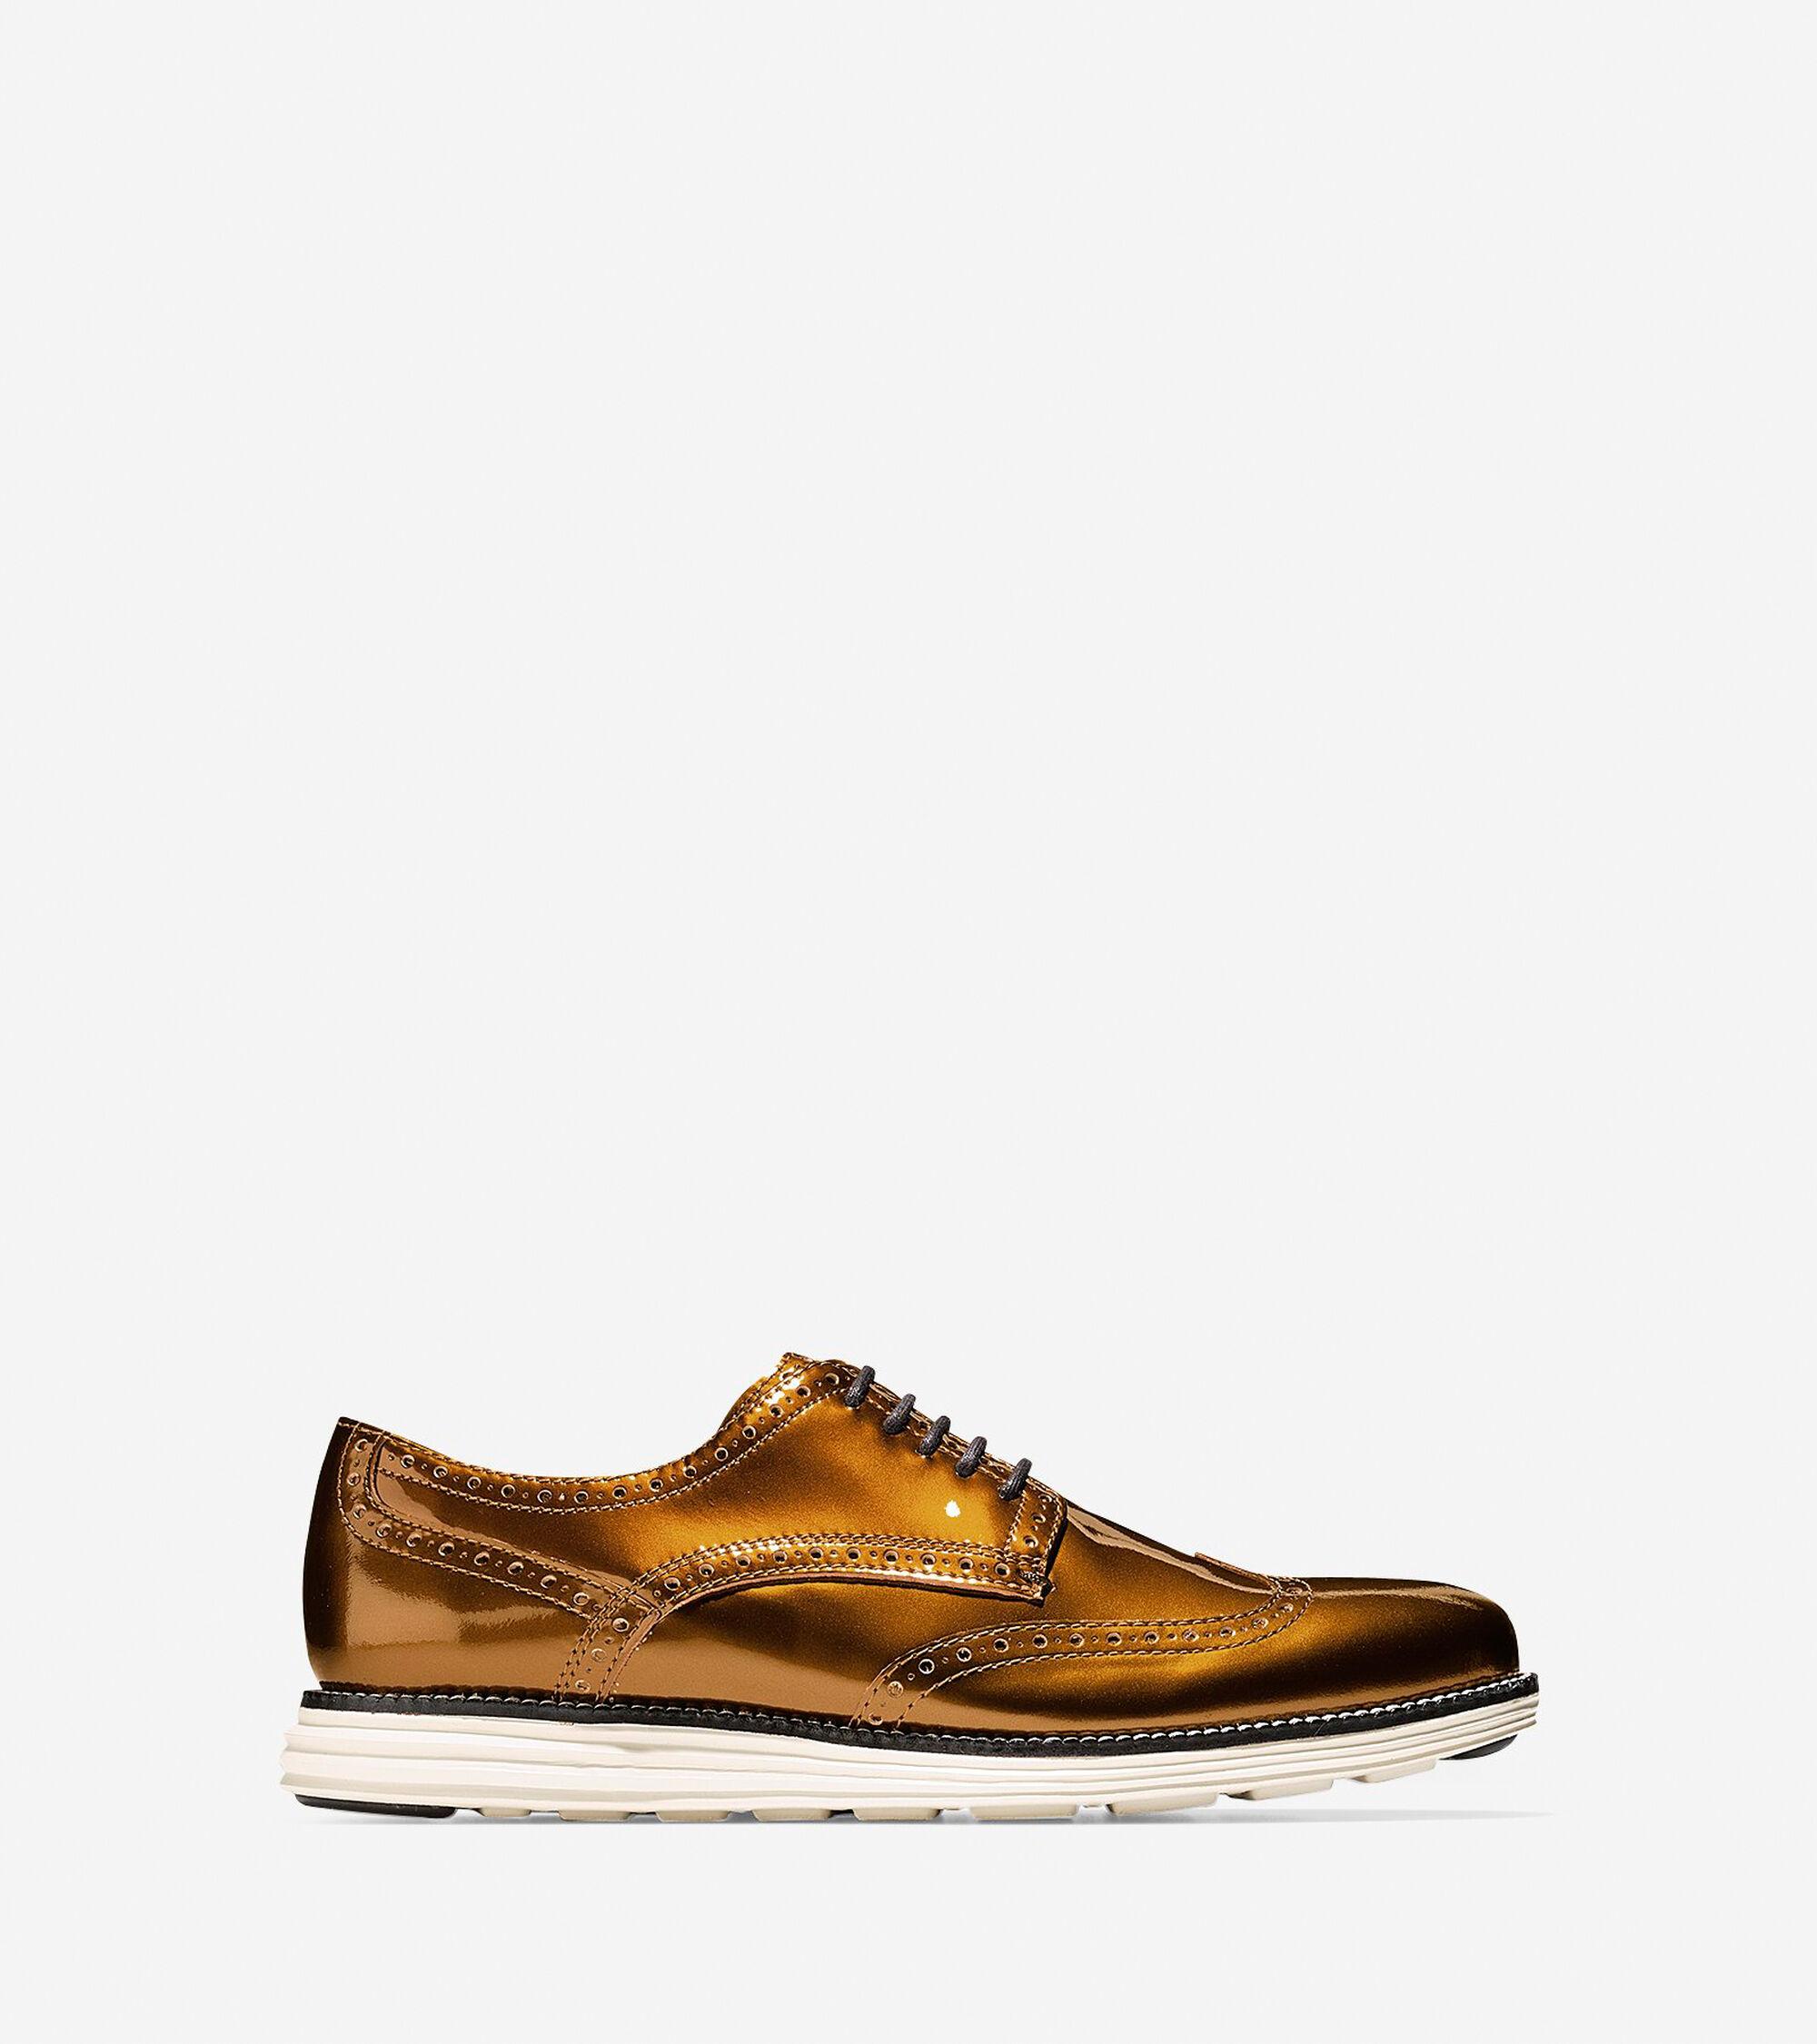 Mens Cole Haan Original Grand Wingtip Oxford Shoes